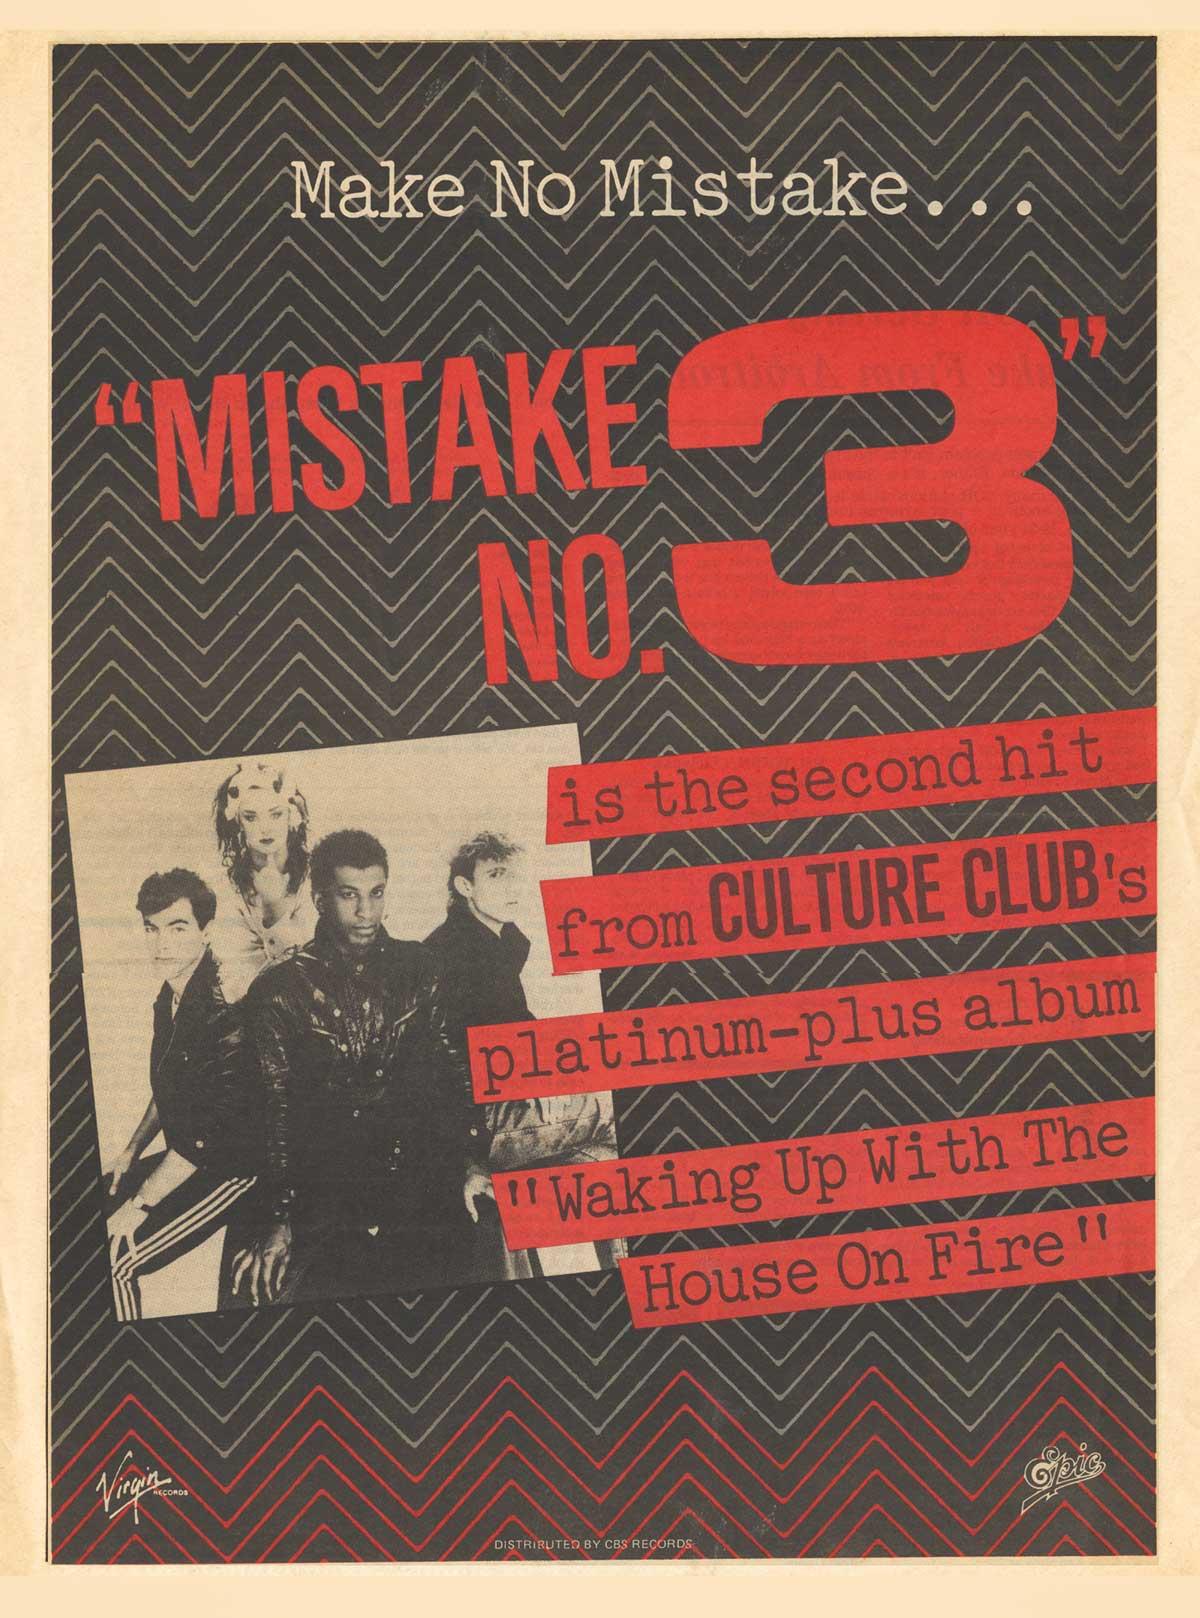 cultureclub2-1200.jpg